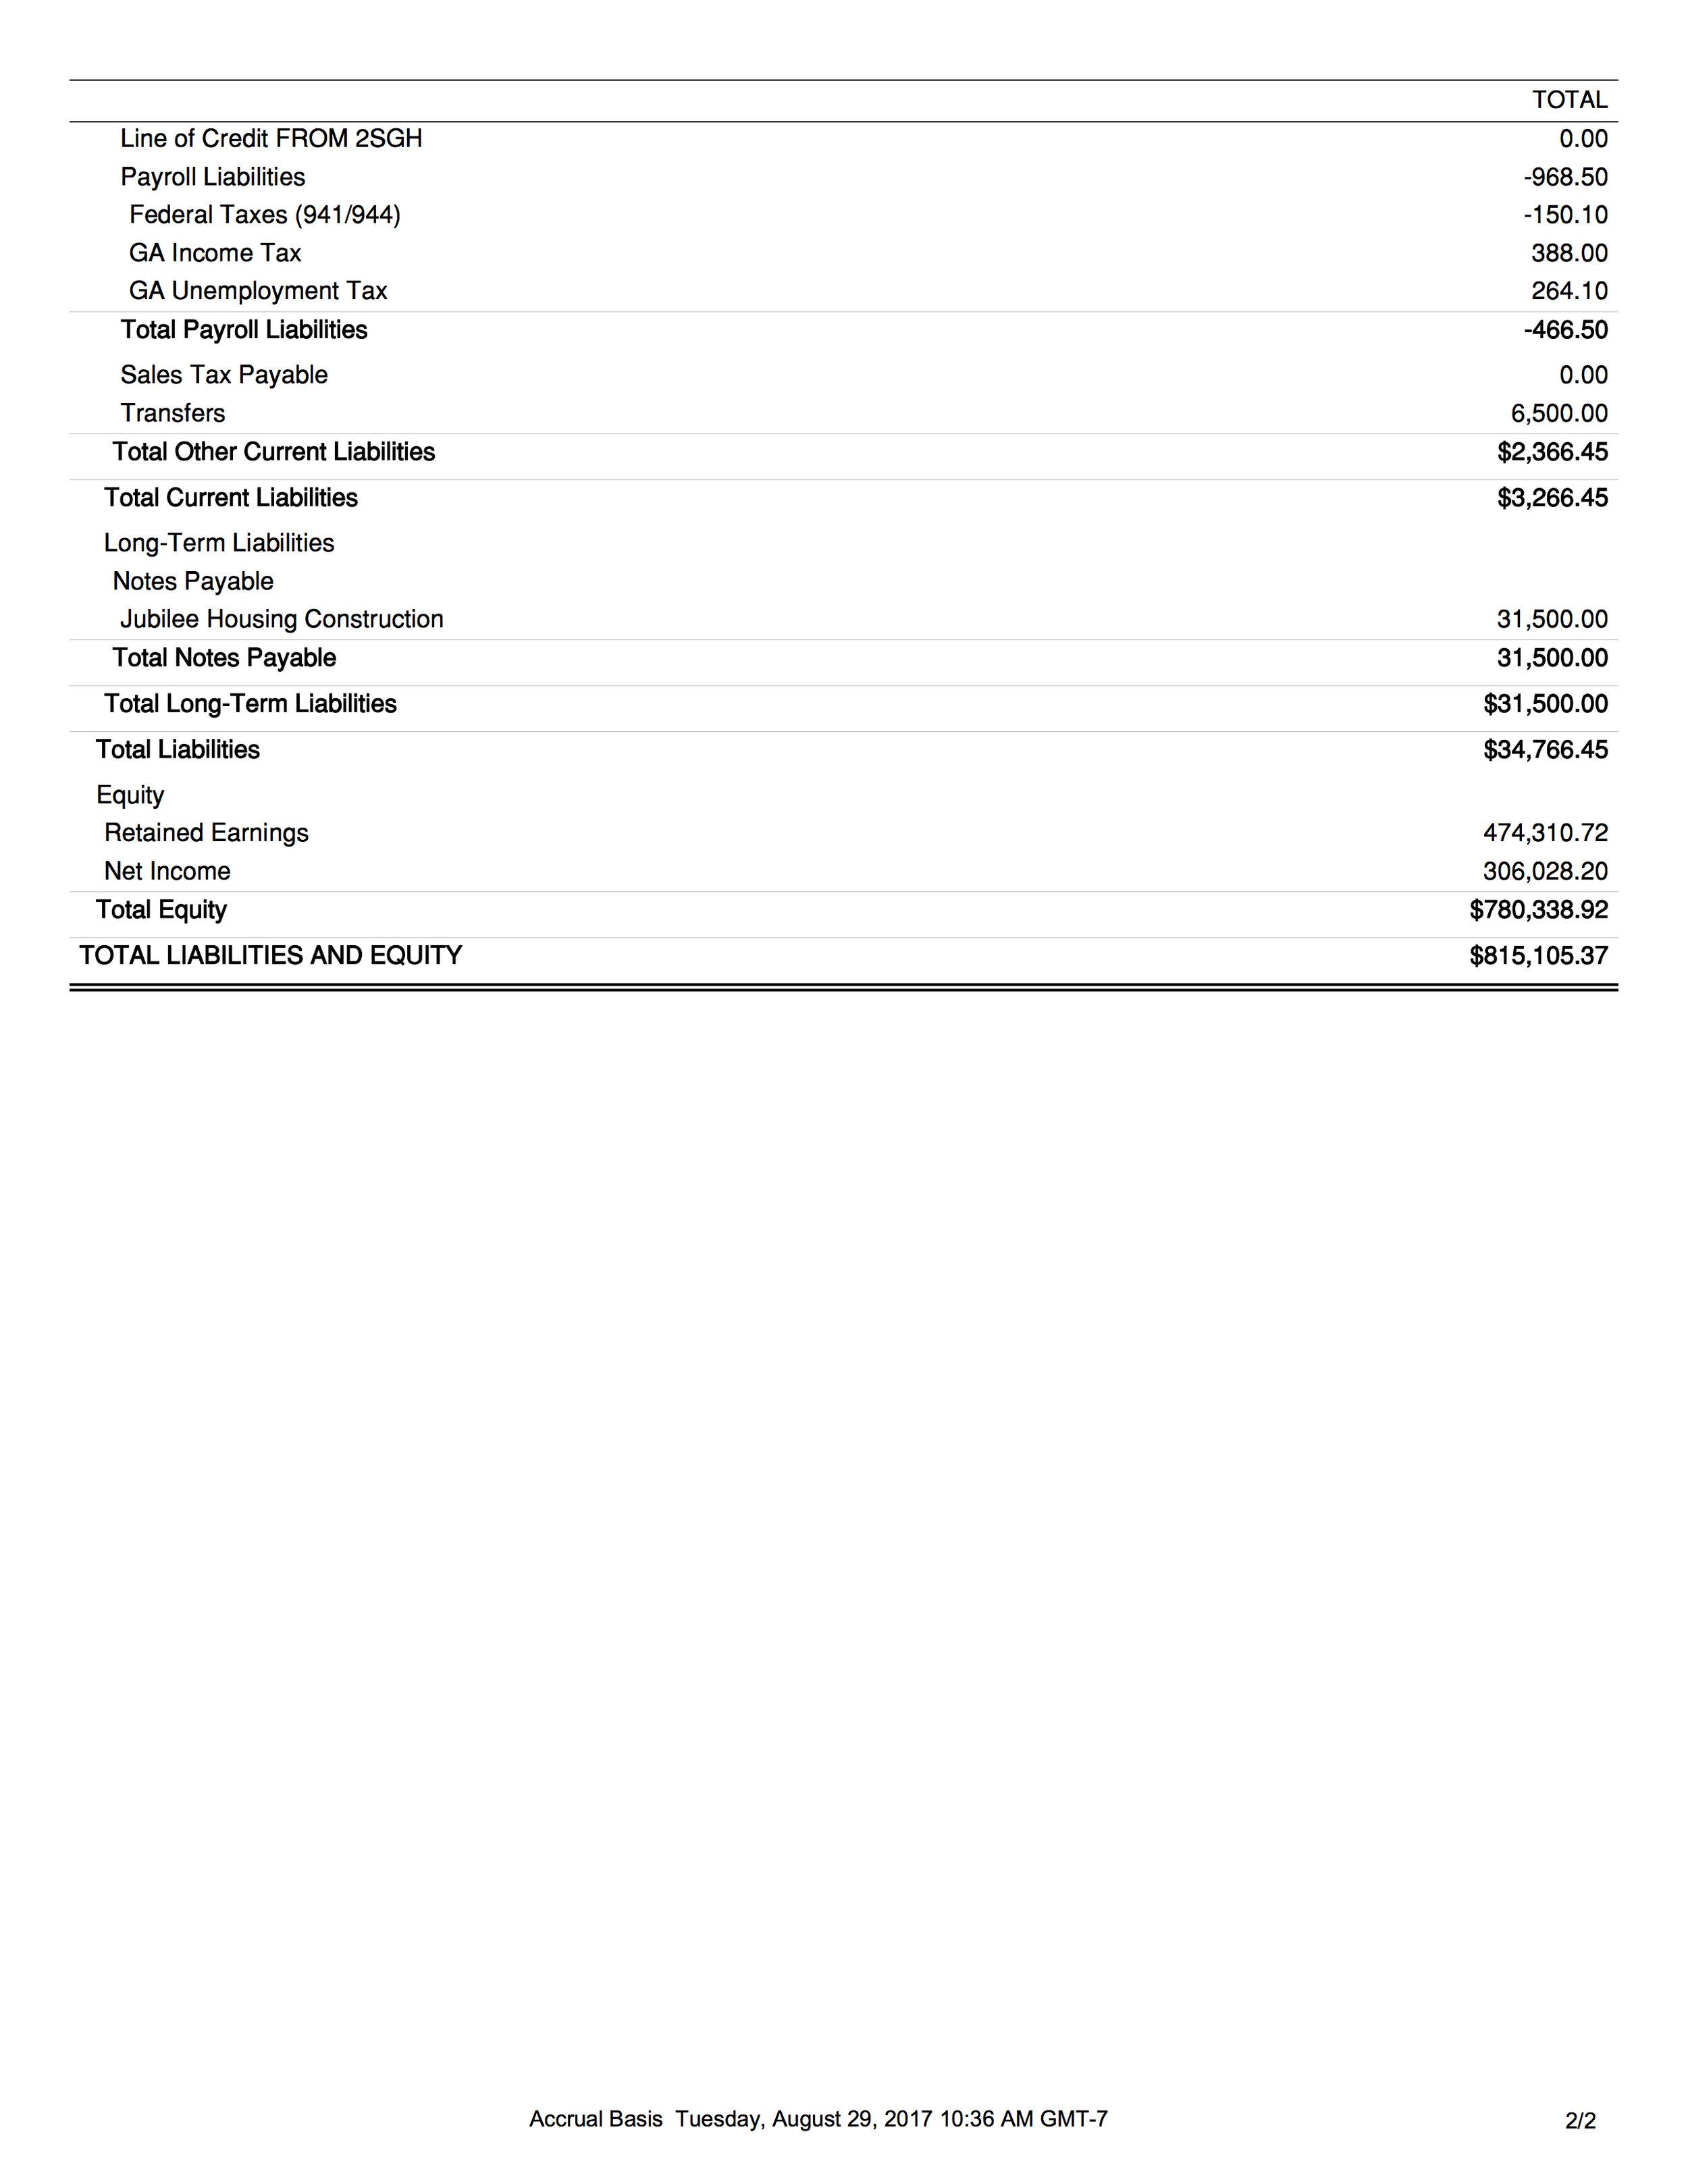 Balence Sheet pg 2.jpg